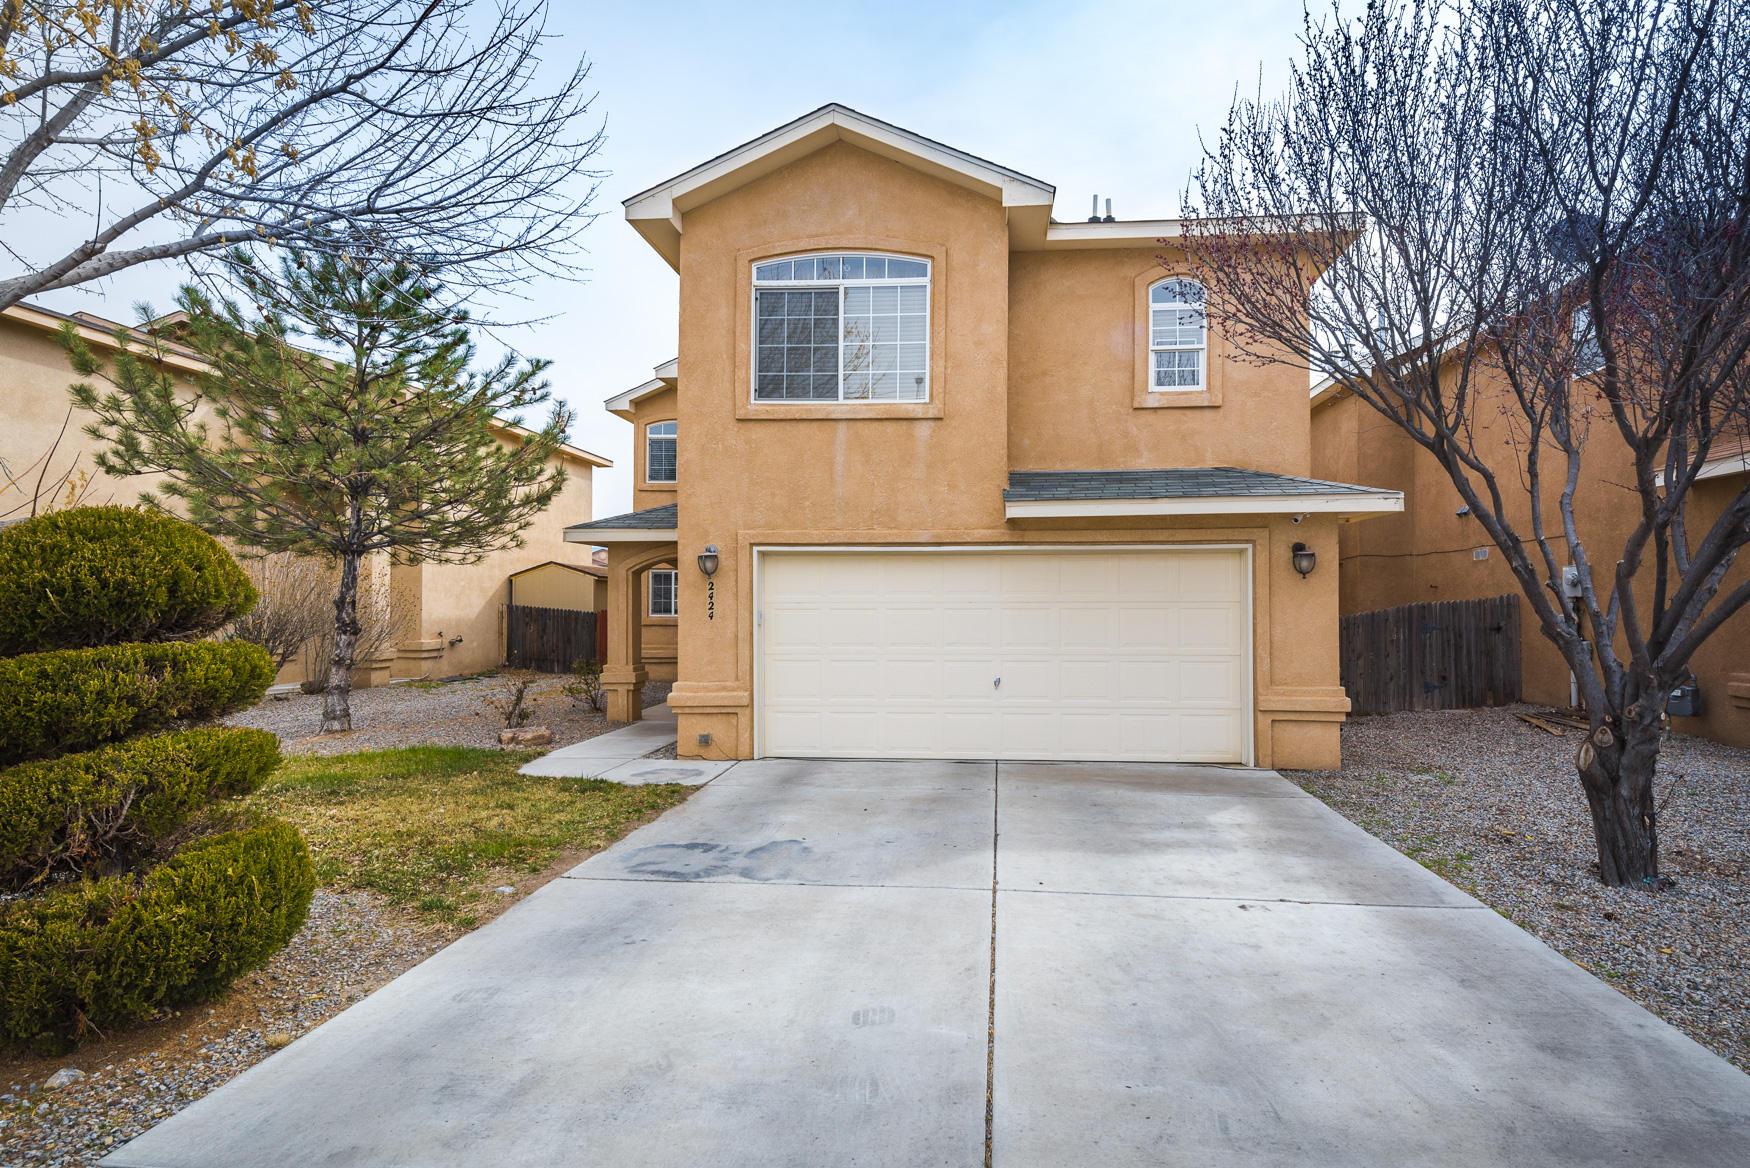 2424 NW Red Polard Court, Northwest Albuquerque and Northwest Heights, New Mexico